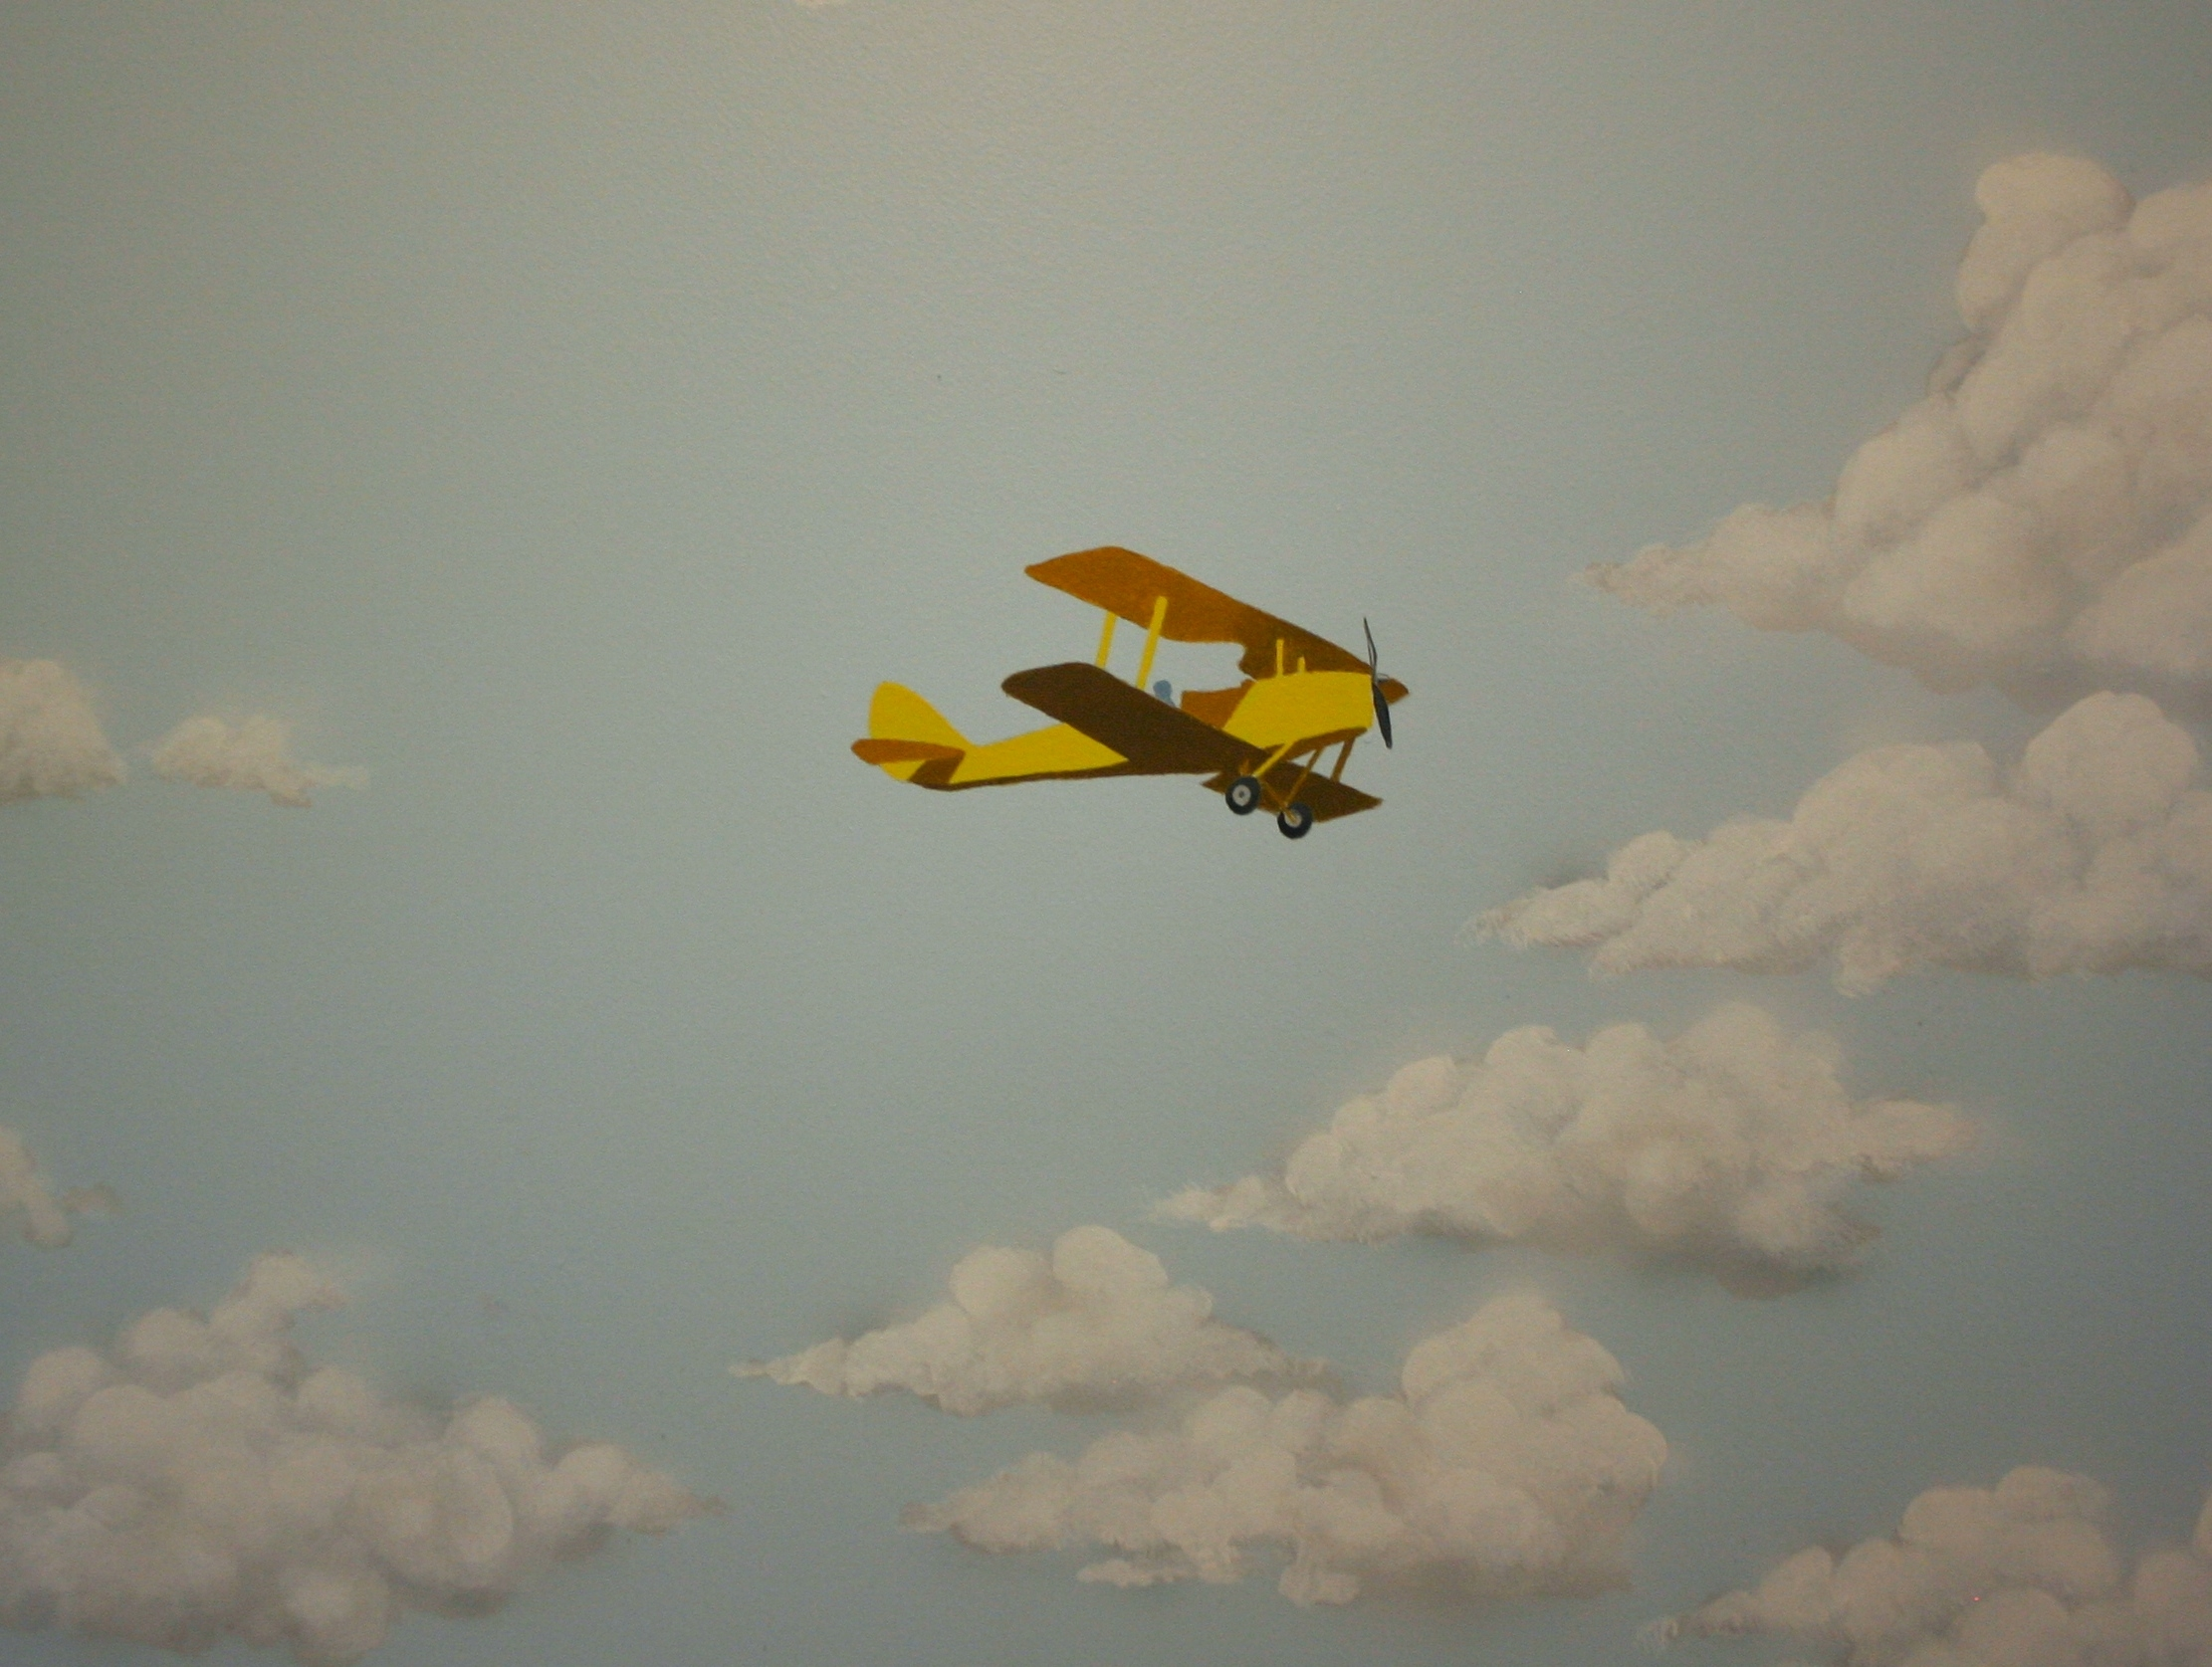 Small plane detail